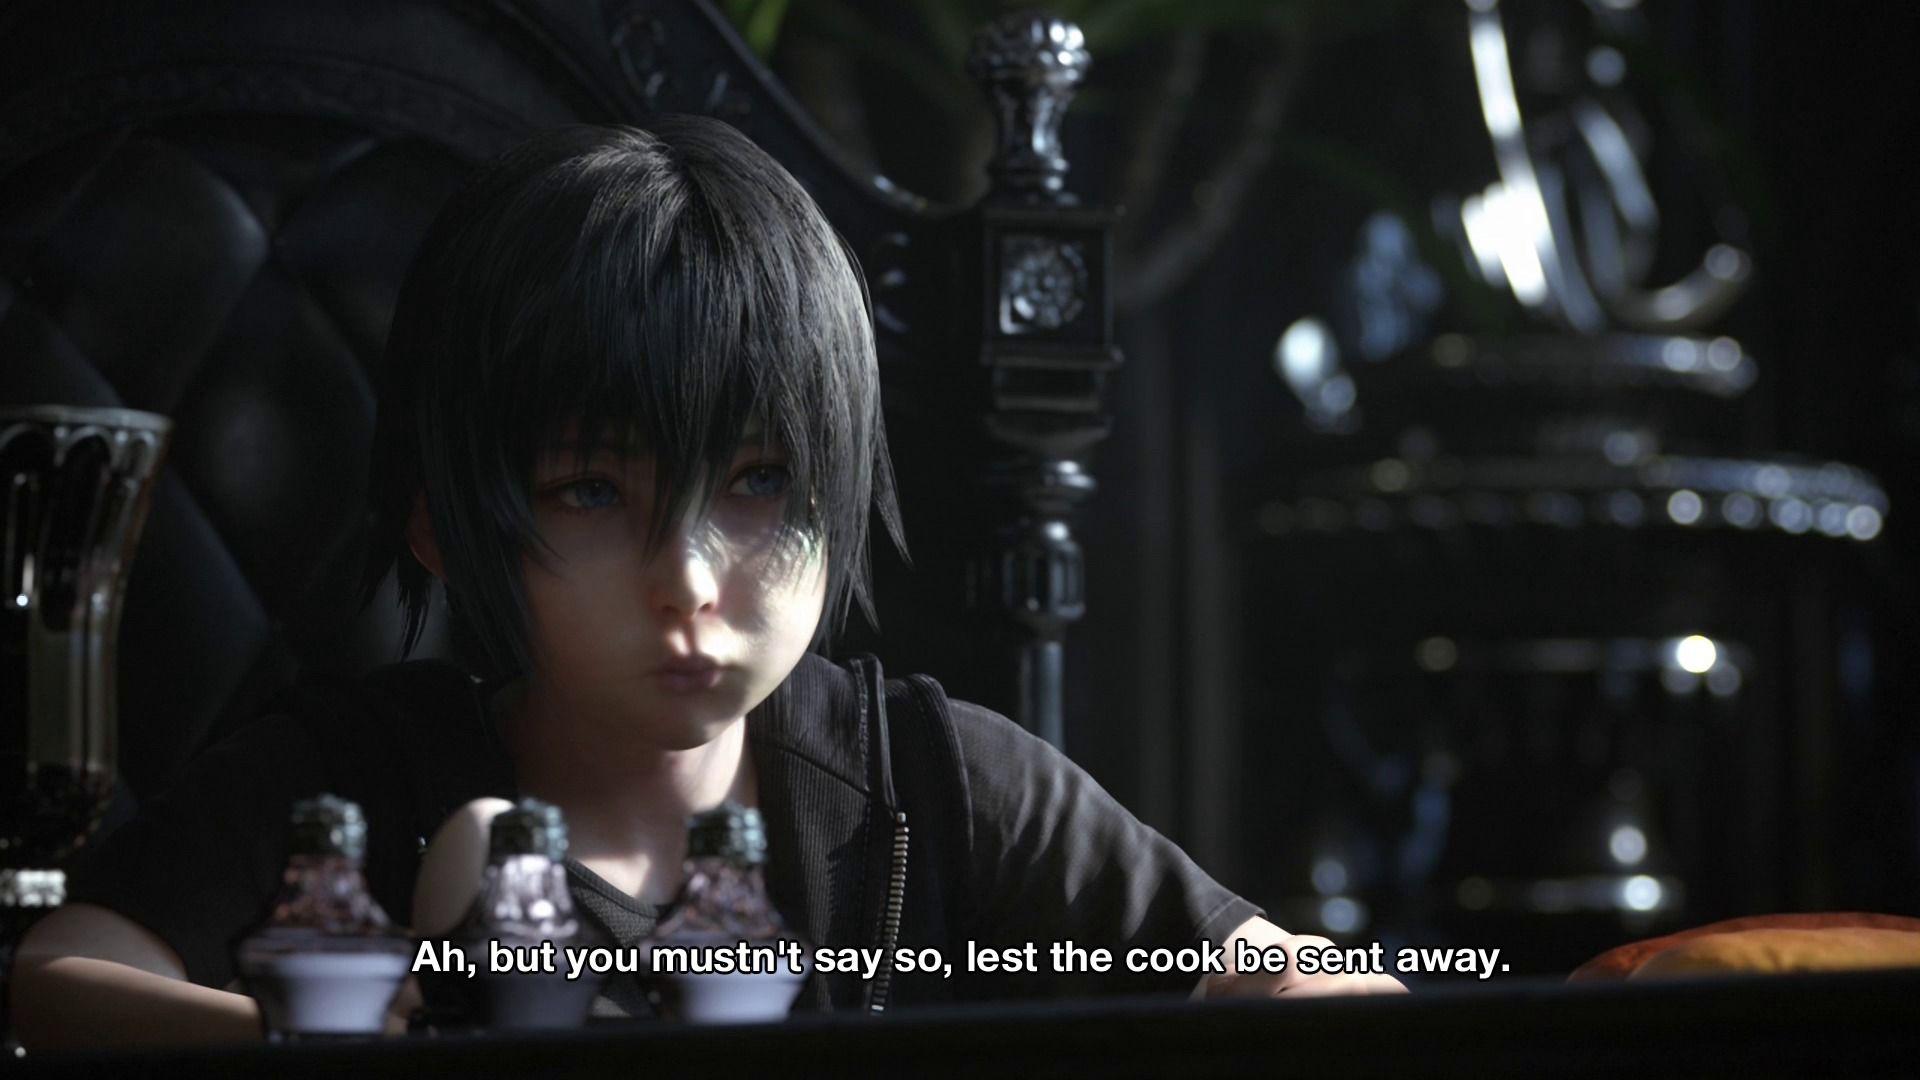 Noctis Lucis Caelum Final Fantasy Xv 4k Hd Games 4k: Noctis OMFG OMFG OMFG OMFG *O* Noctis